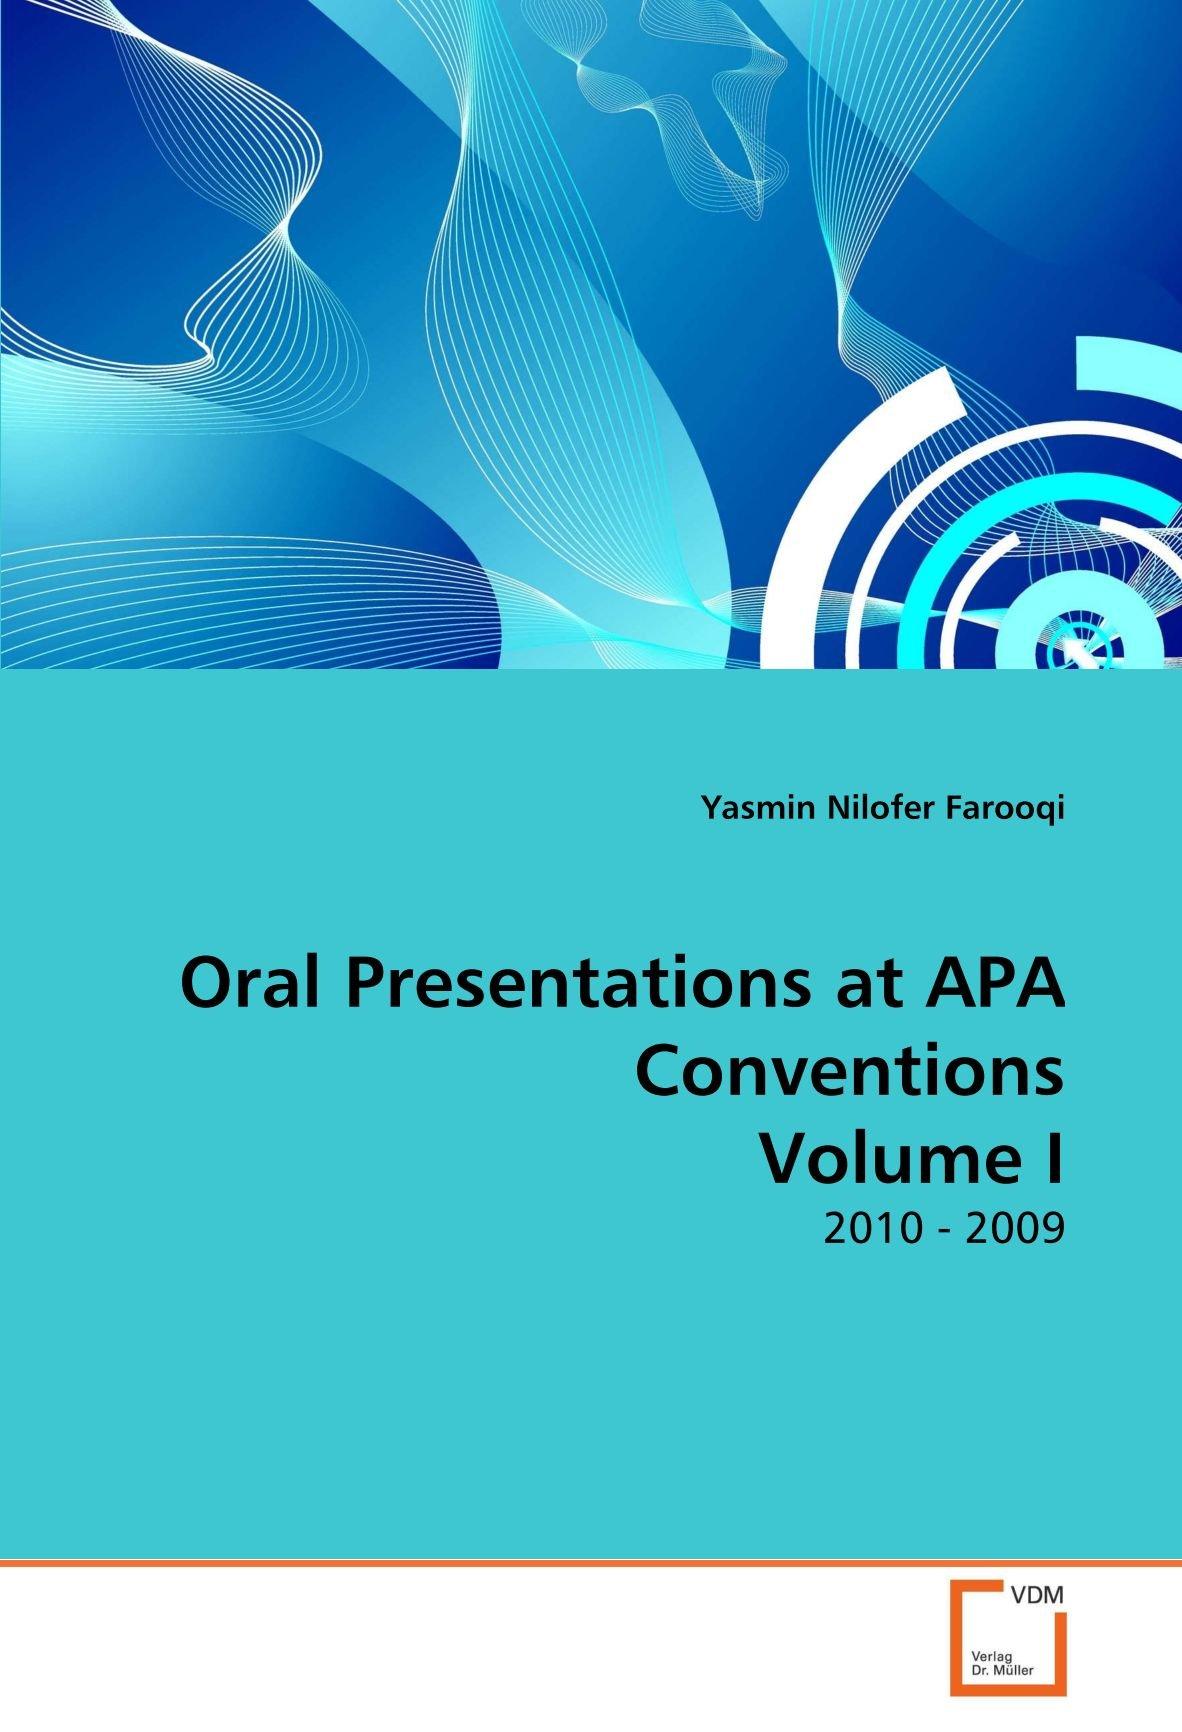 Download Oral Presentations at APA Conventions Volume I: 2010 - 2009 PDF